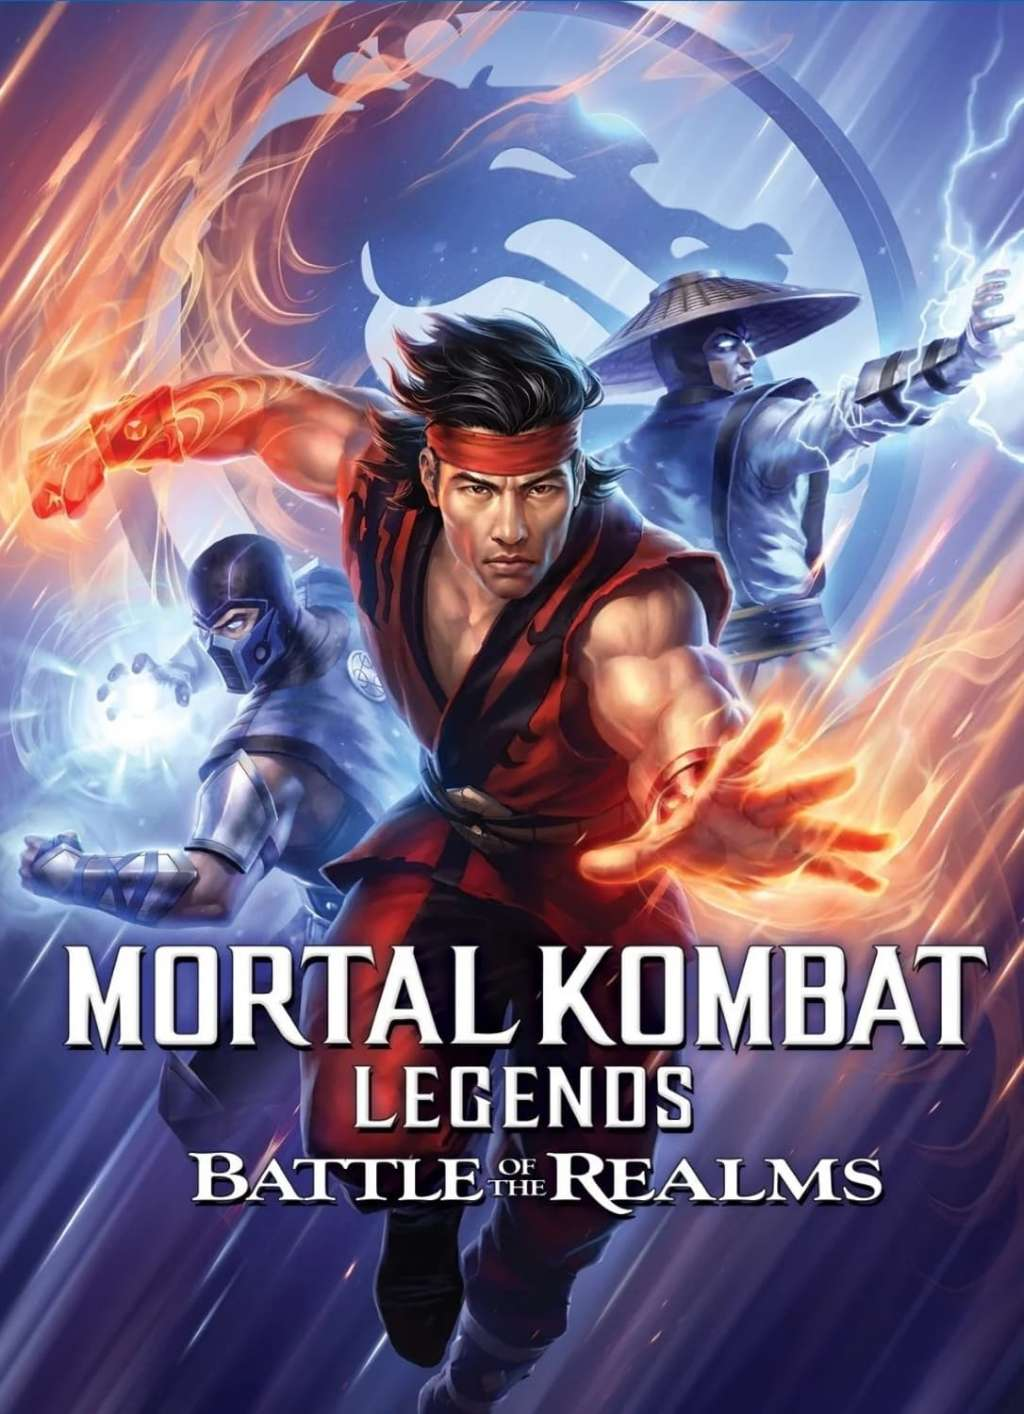 Mortal Kombat Legends: Battle of the Realms kapak